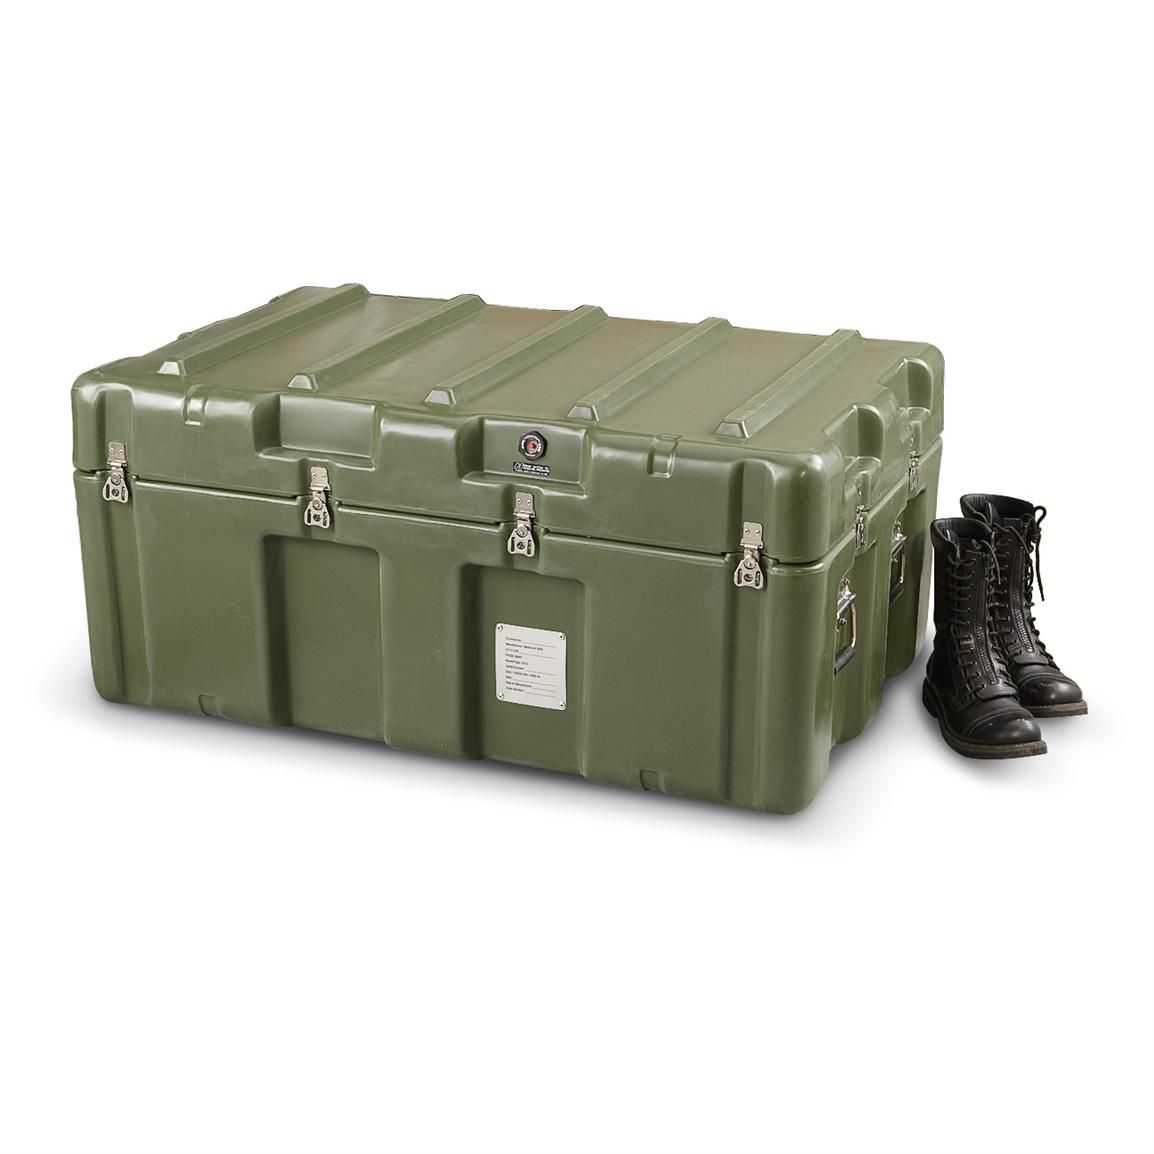 Lovely Waterproof Storage Box